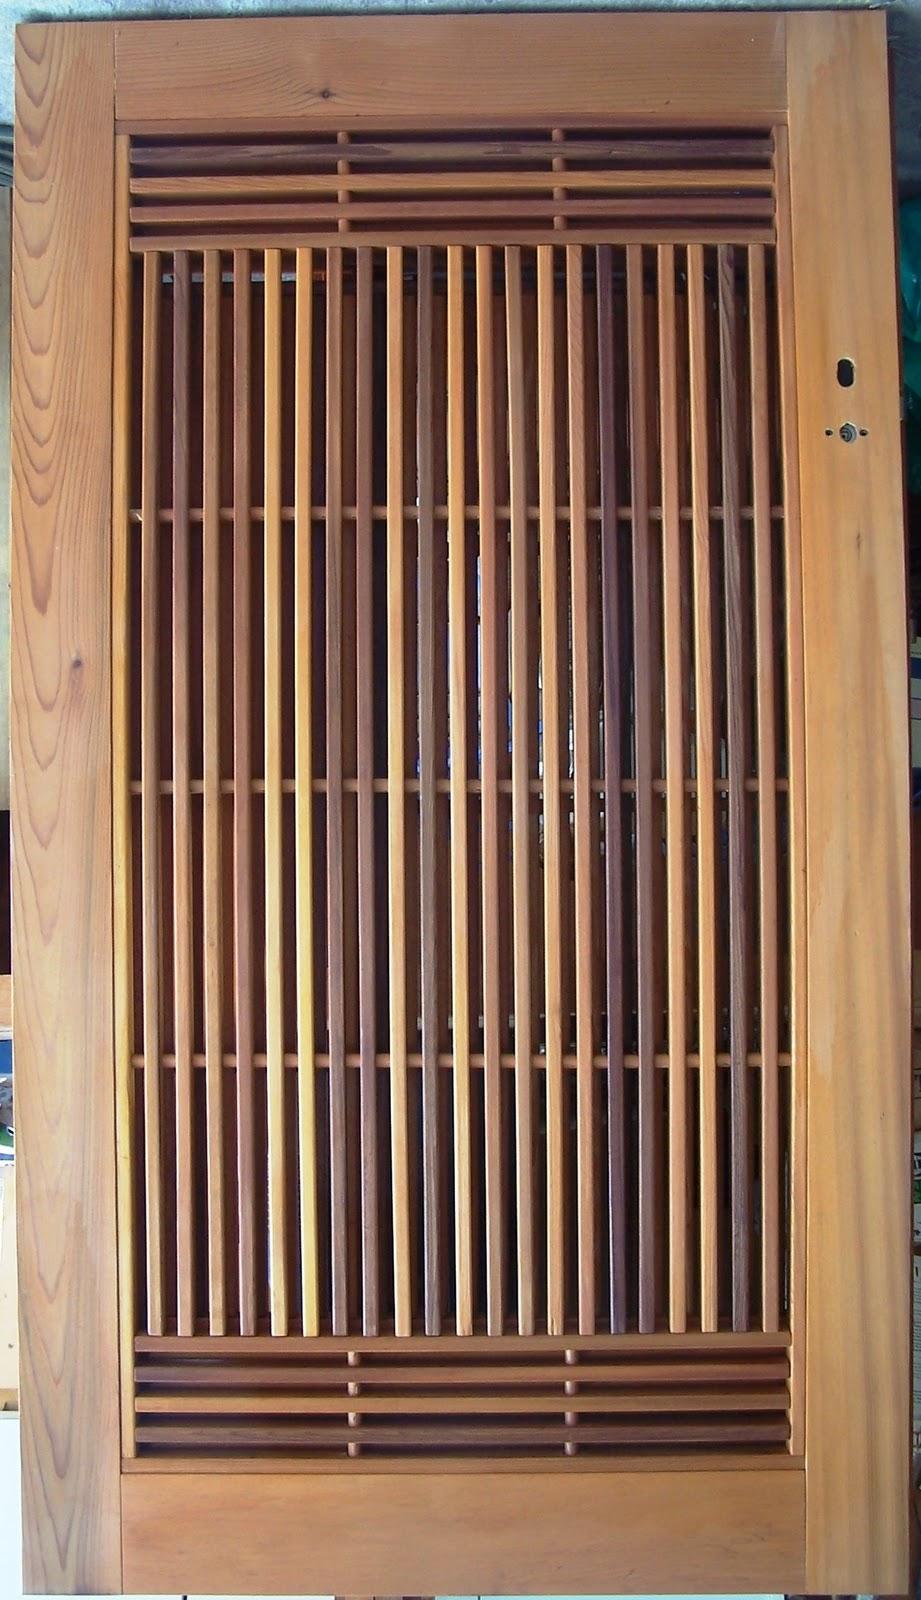 Bamboo Wood Door : Bamboo grove photo doors